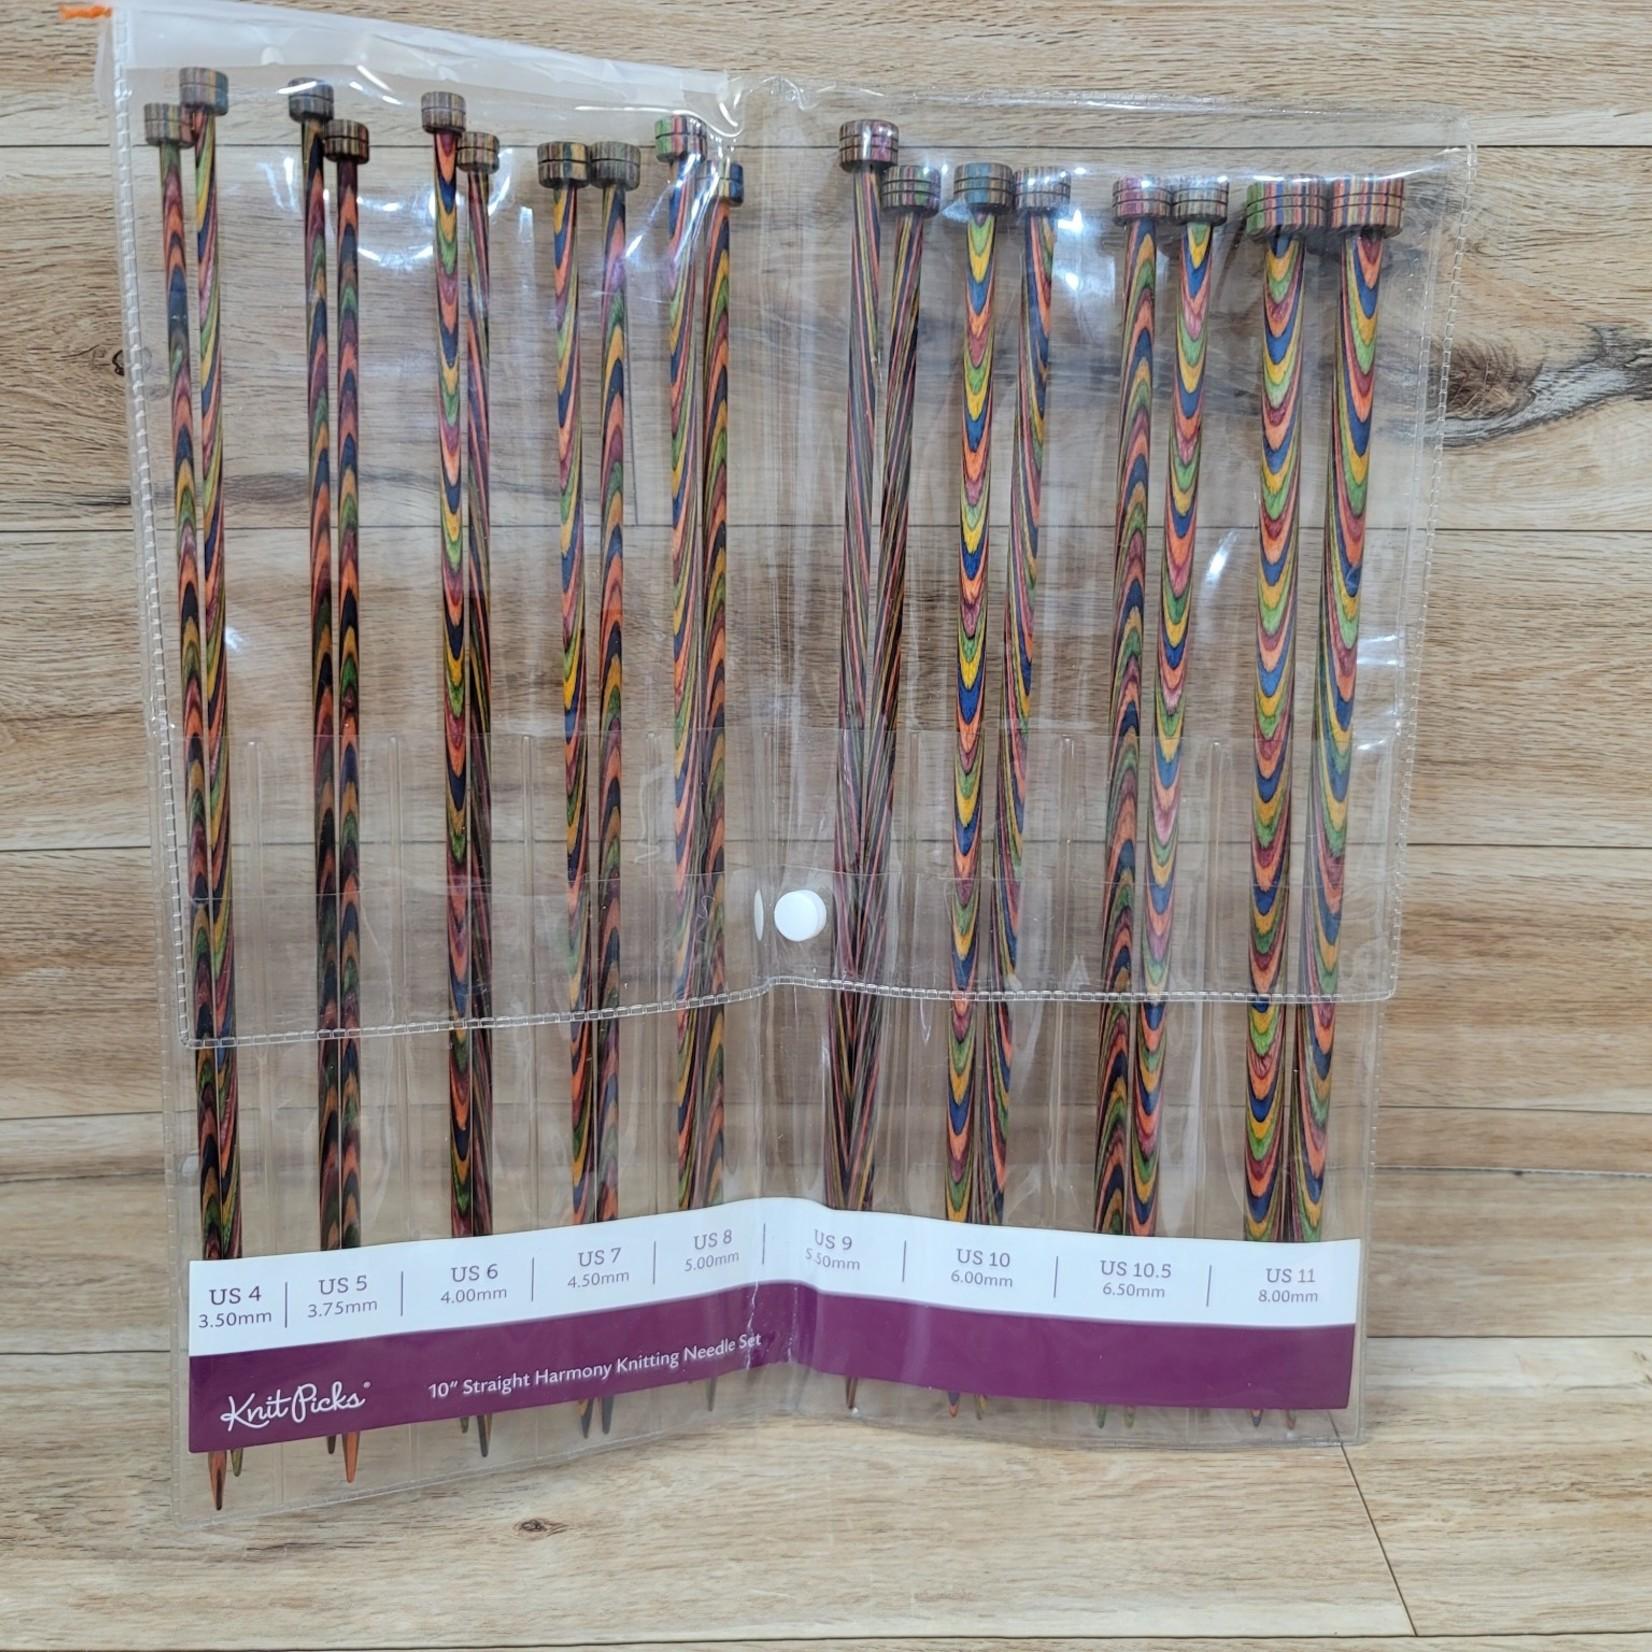 "Knit Picks 10"" Straight Harmonwy Knitting Needle Set"